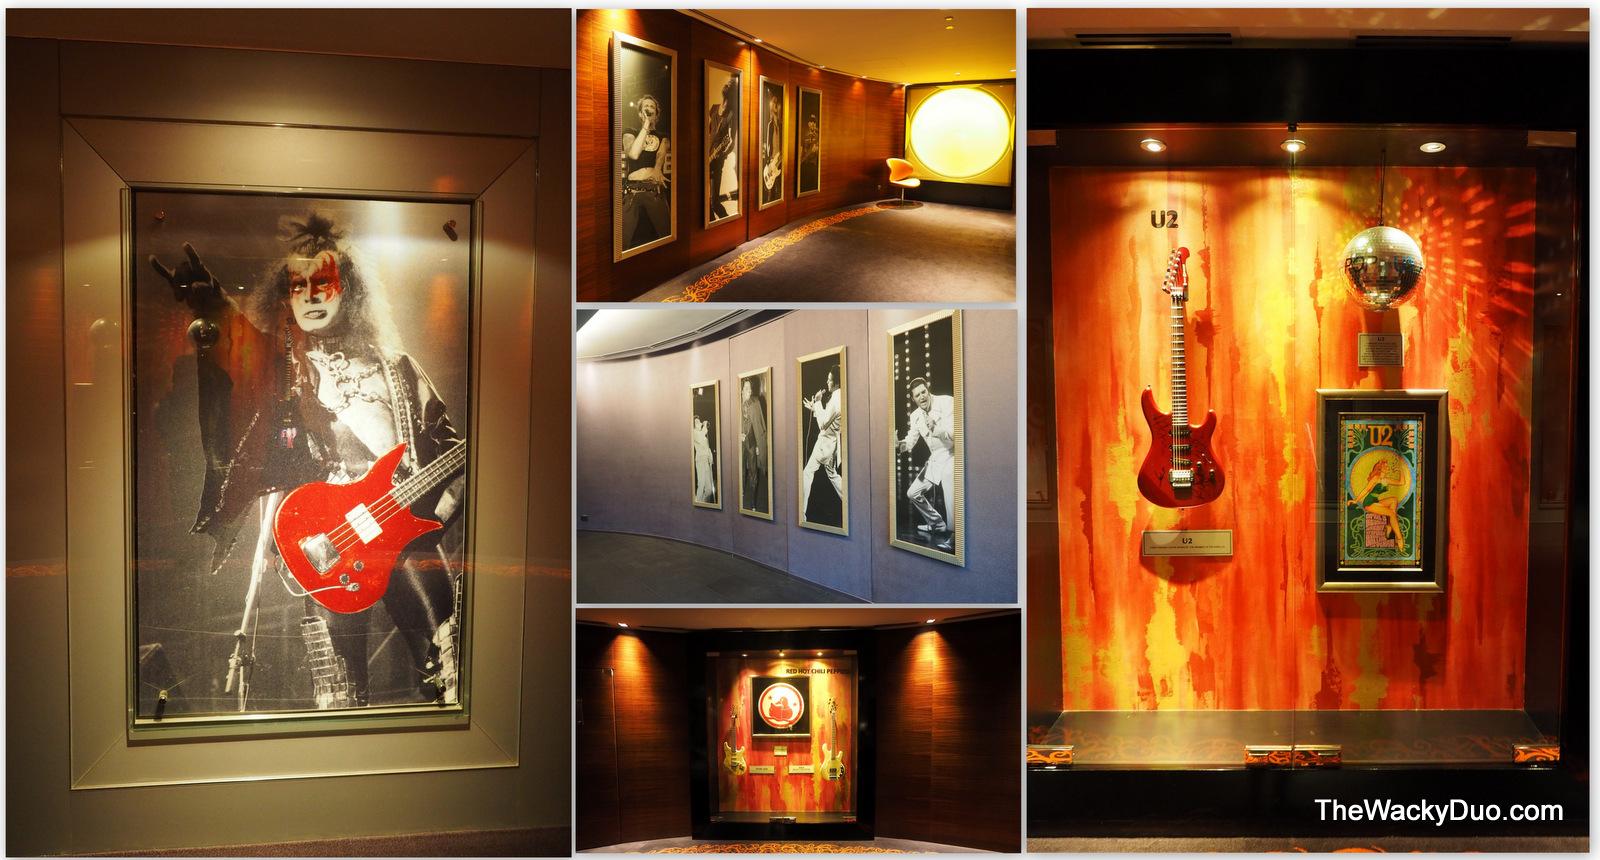 Rws Hard Rock Hotel Staycation The Wacky Duo Singapore